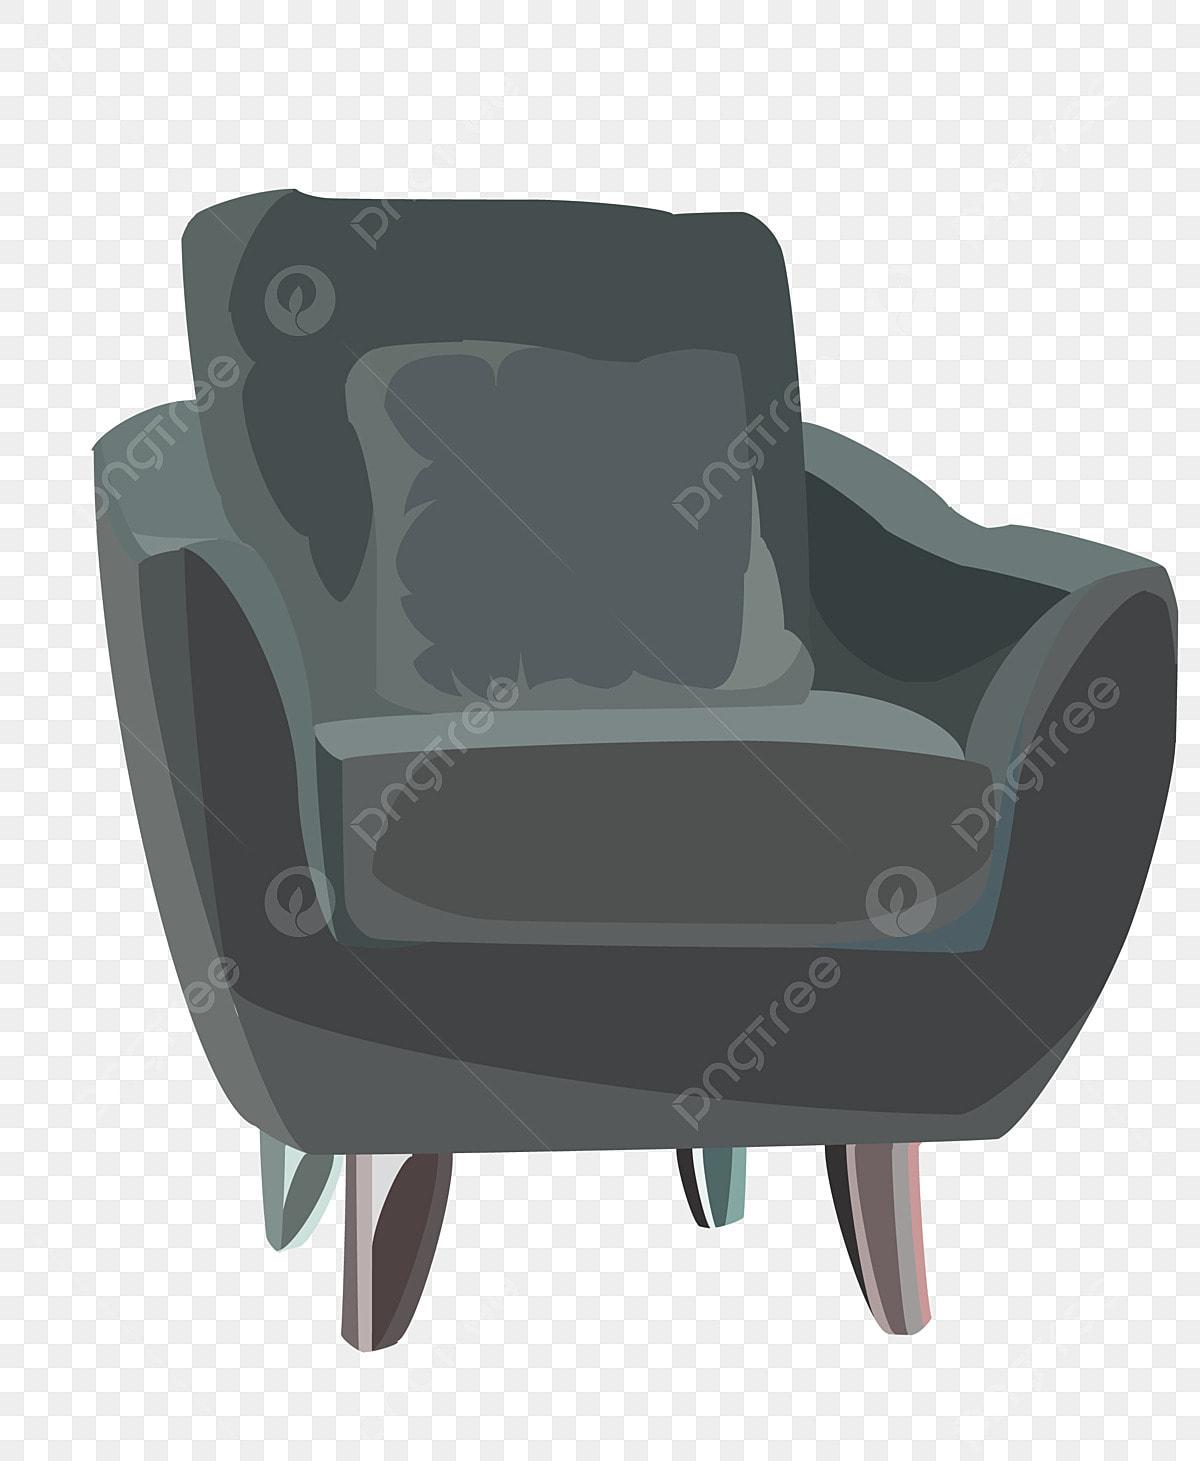 Sofa Furniture Cartoon Illustration Cartoon Illustration